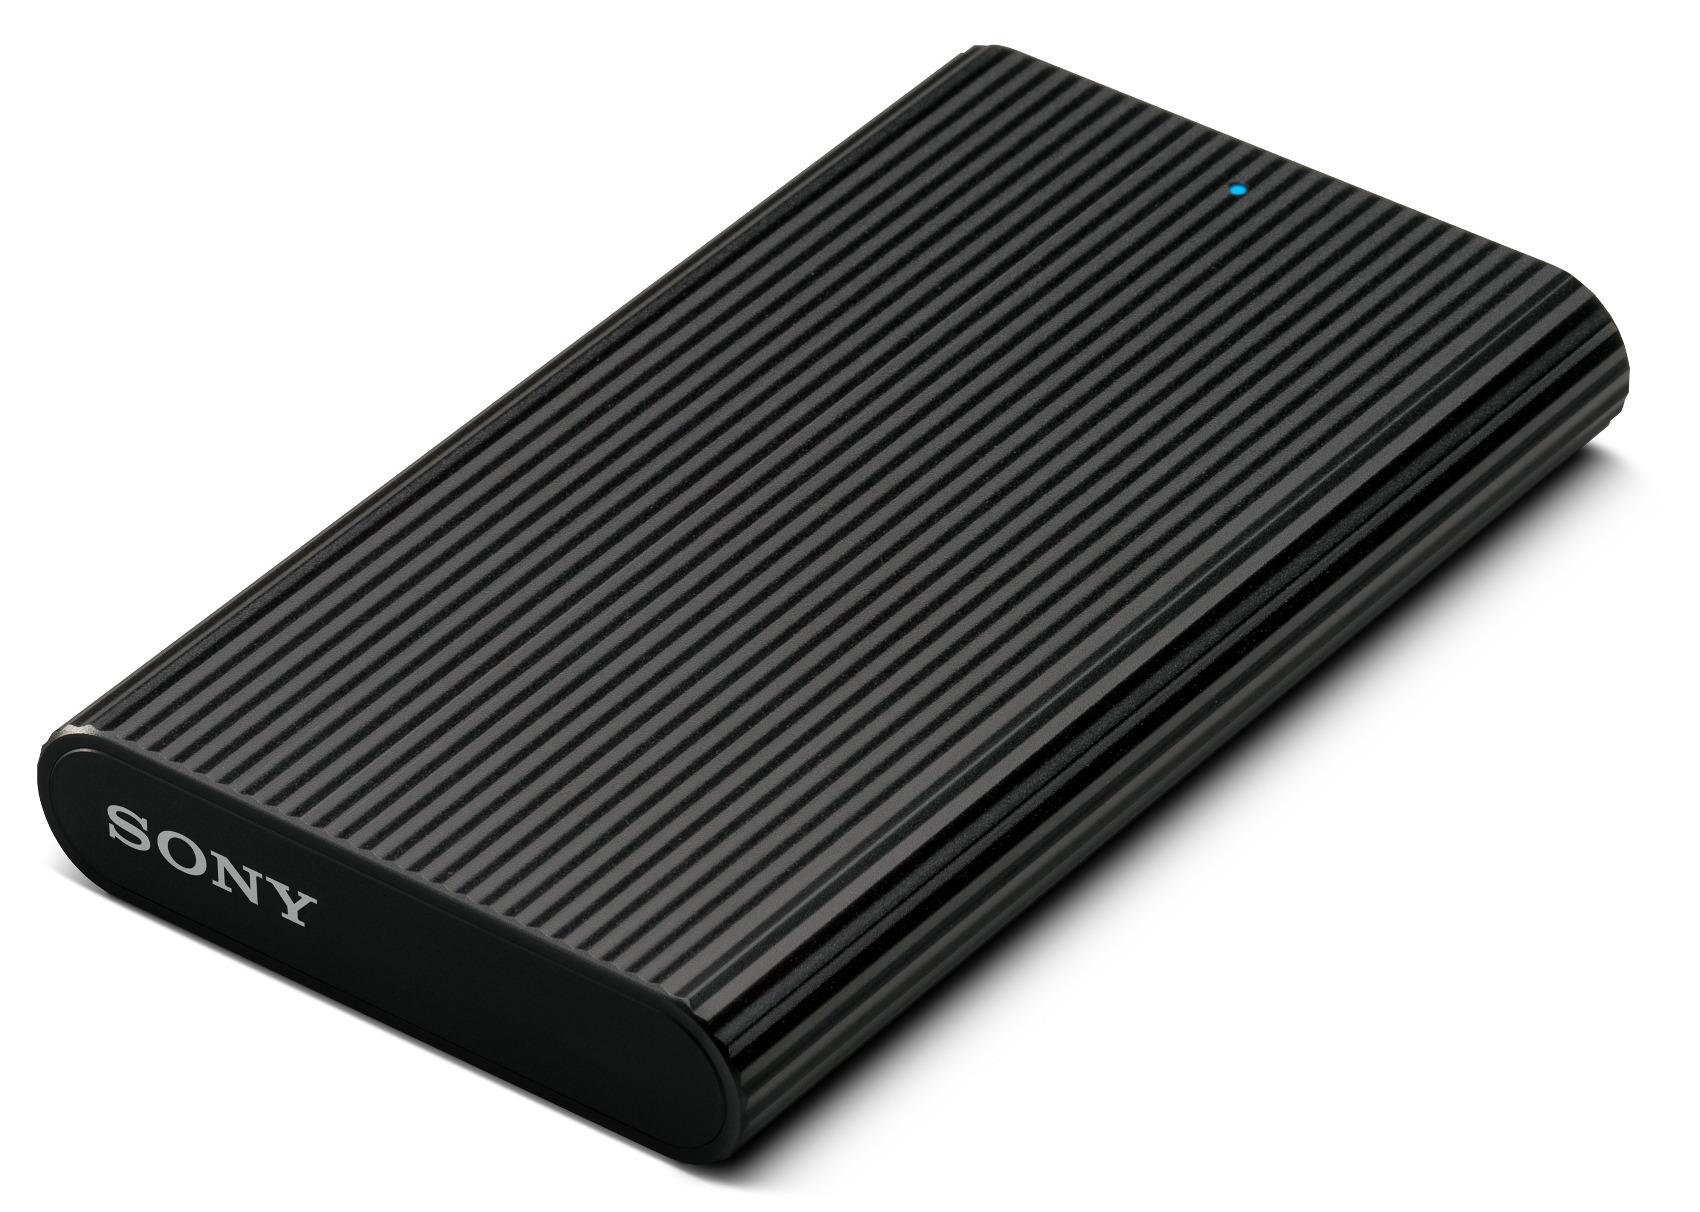 960GB Sony SL-E1BT External Solid State Drive w/ USB Type-C Port